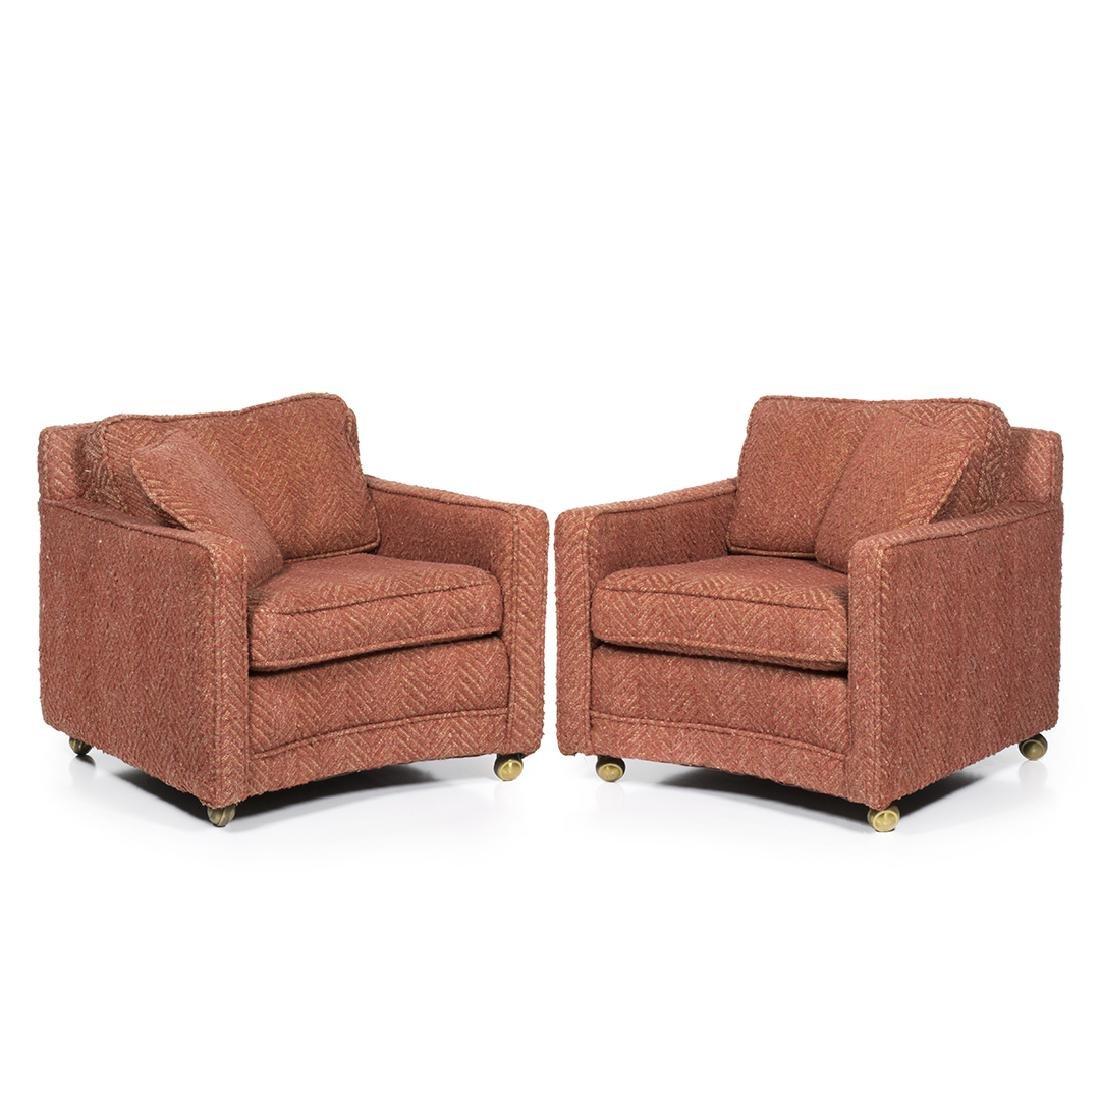 T.H. Robsjohn-Gibbings Club Chairs